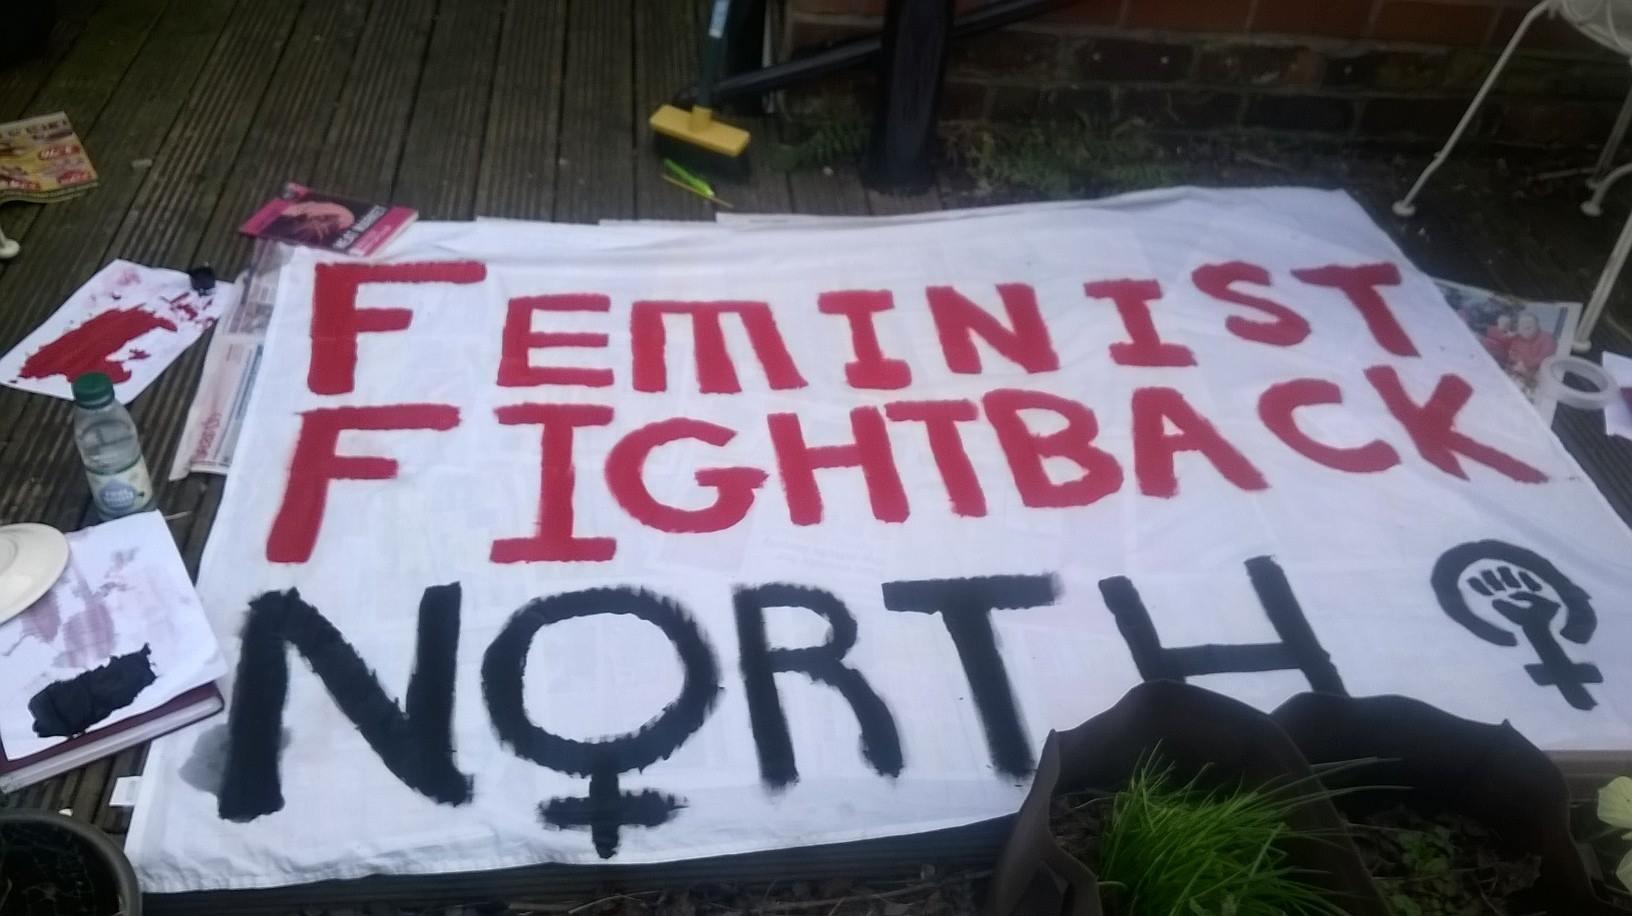 Feminist Fightback North